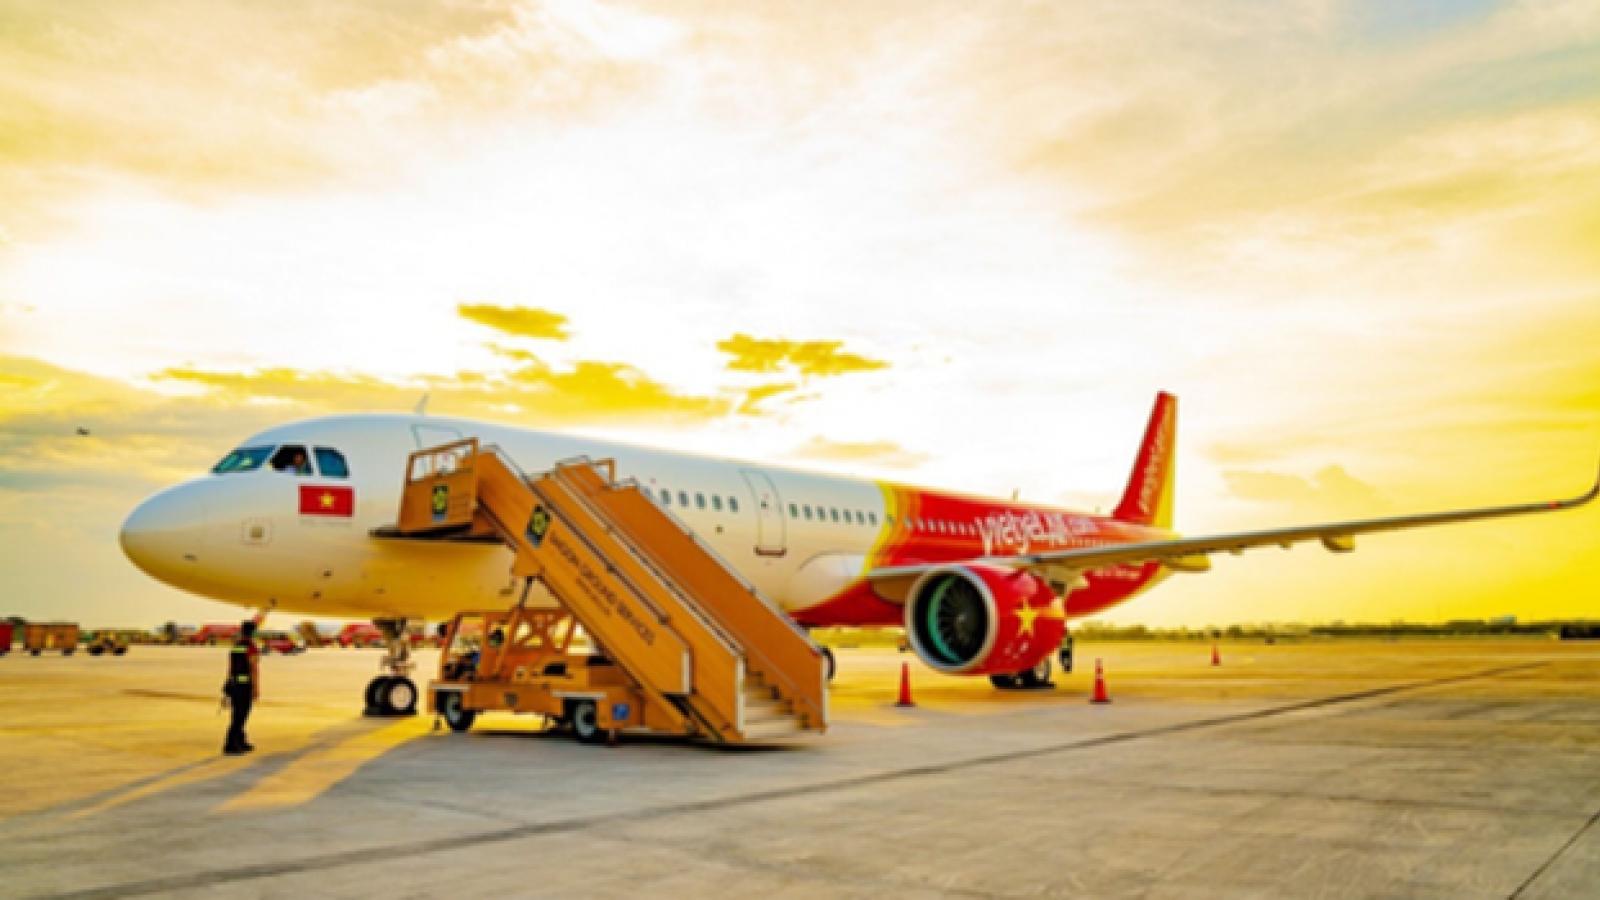 VietJet Air reschedule flights to Japan following impact of storm Matmo